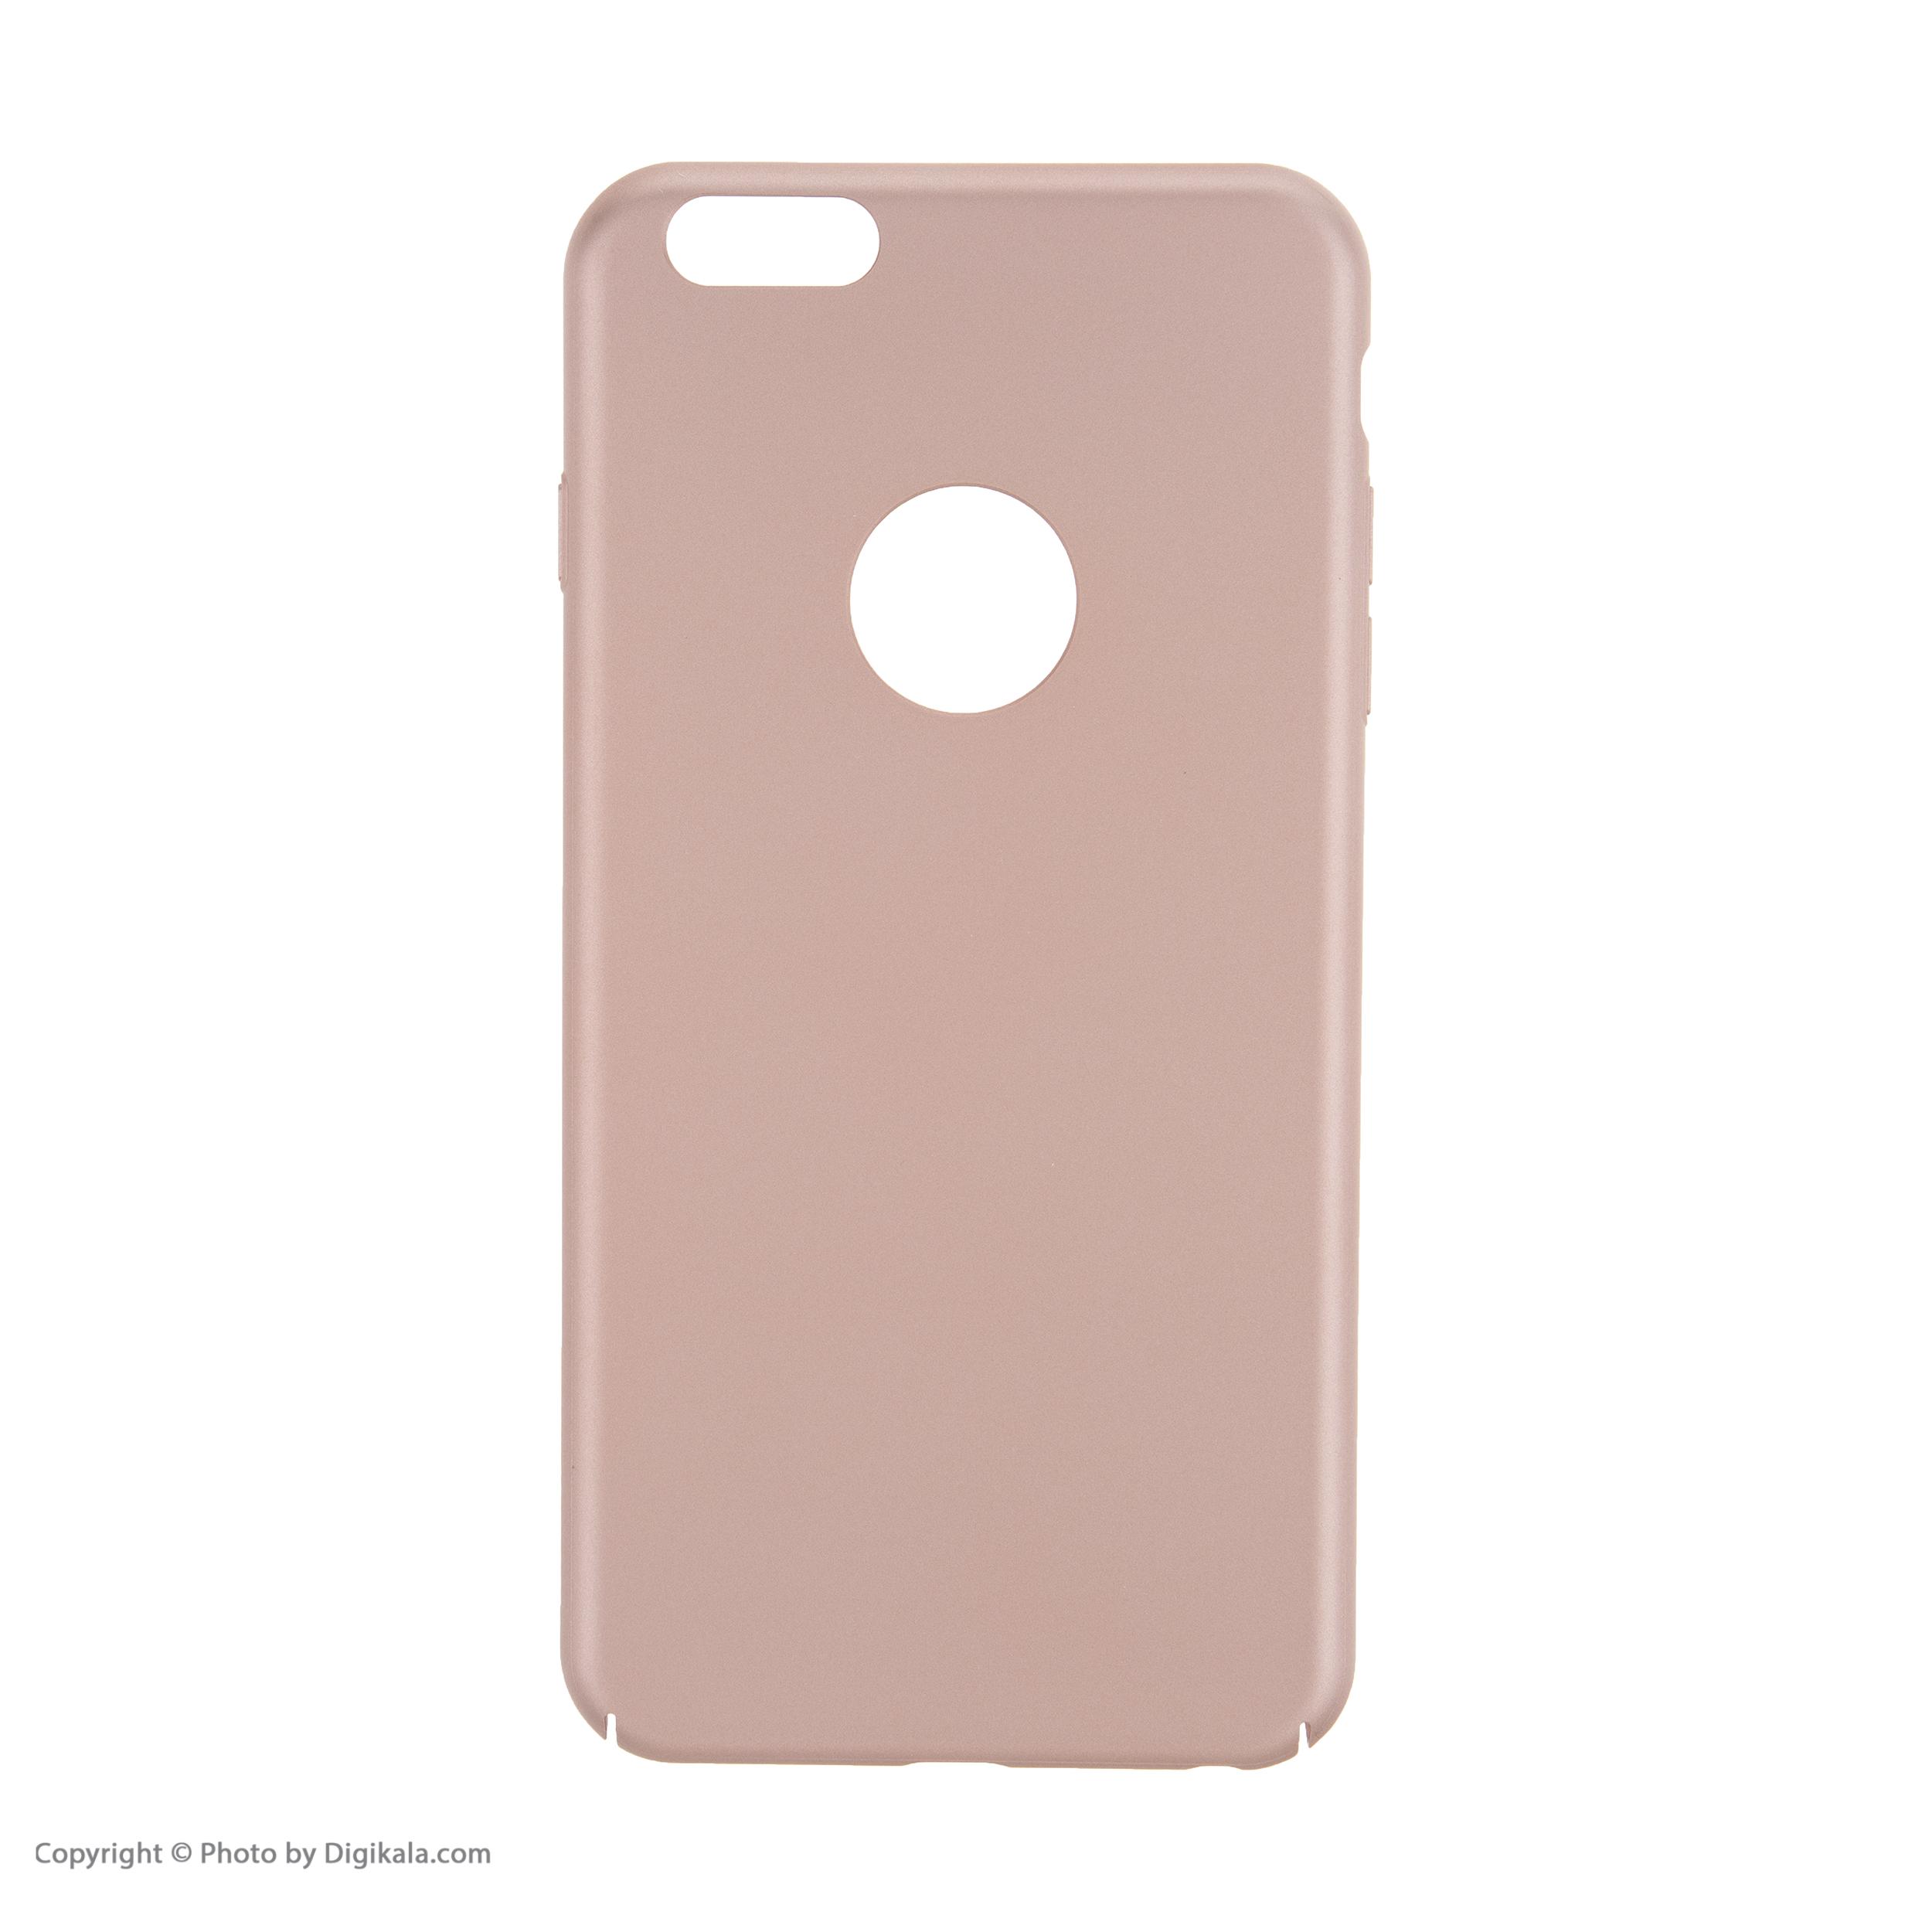 کاور جوی روم مدل JR-BP157 مناسب برای گوشی موبایل اپل iPhone 6 plus/6s plus  main 1 8